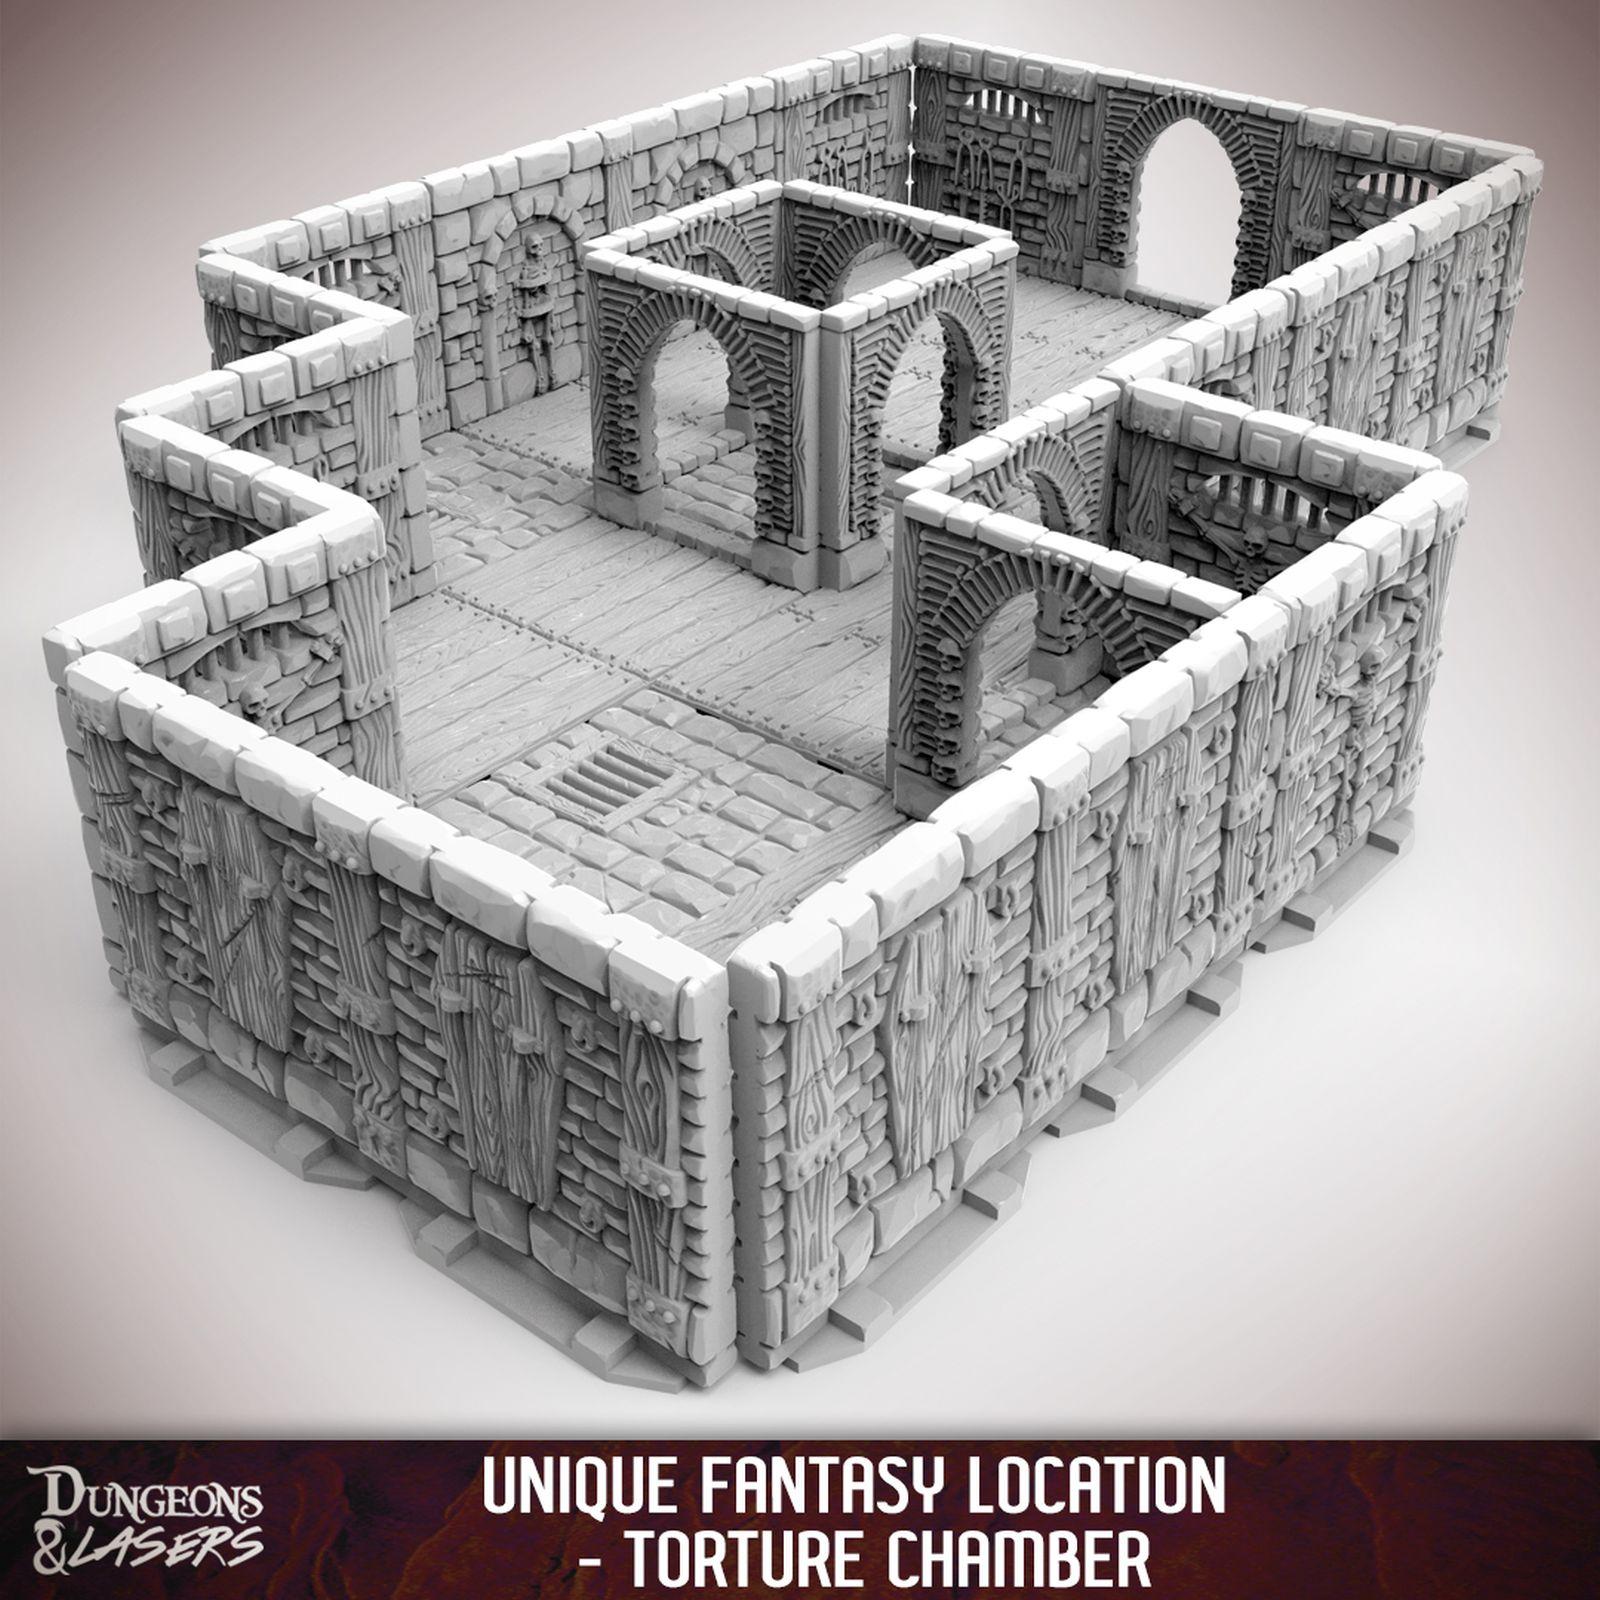 D&L - 1x1 - unique fantasy location.jpg